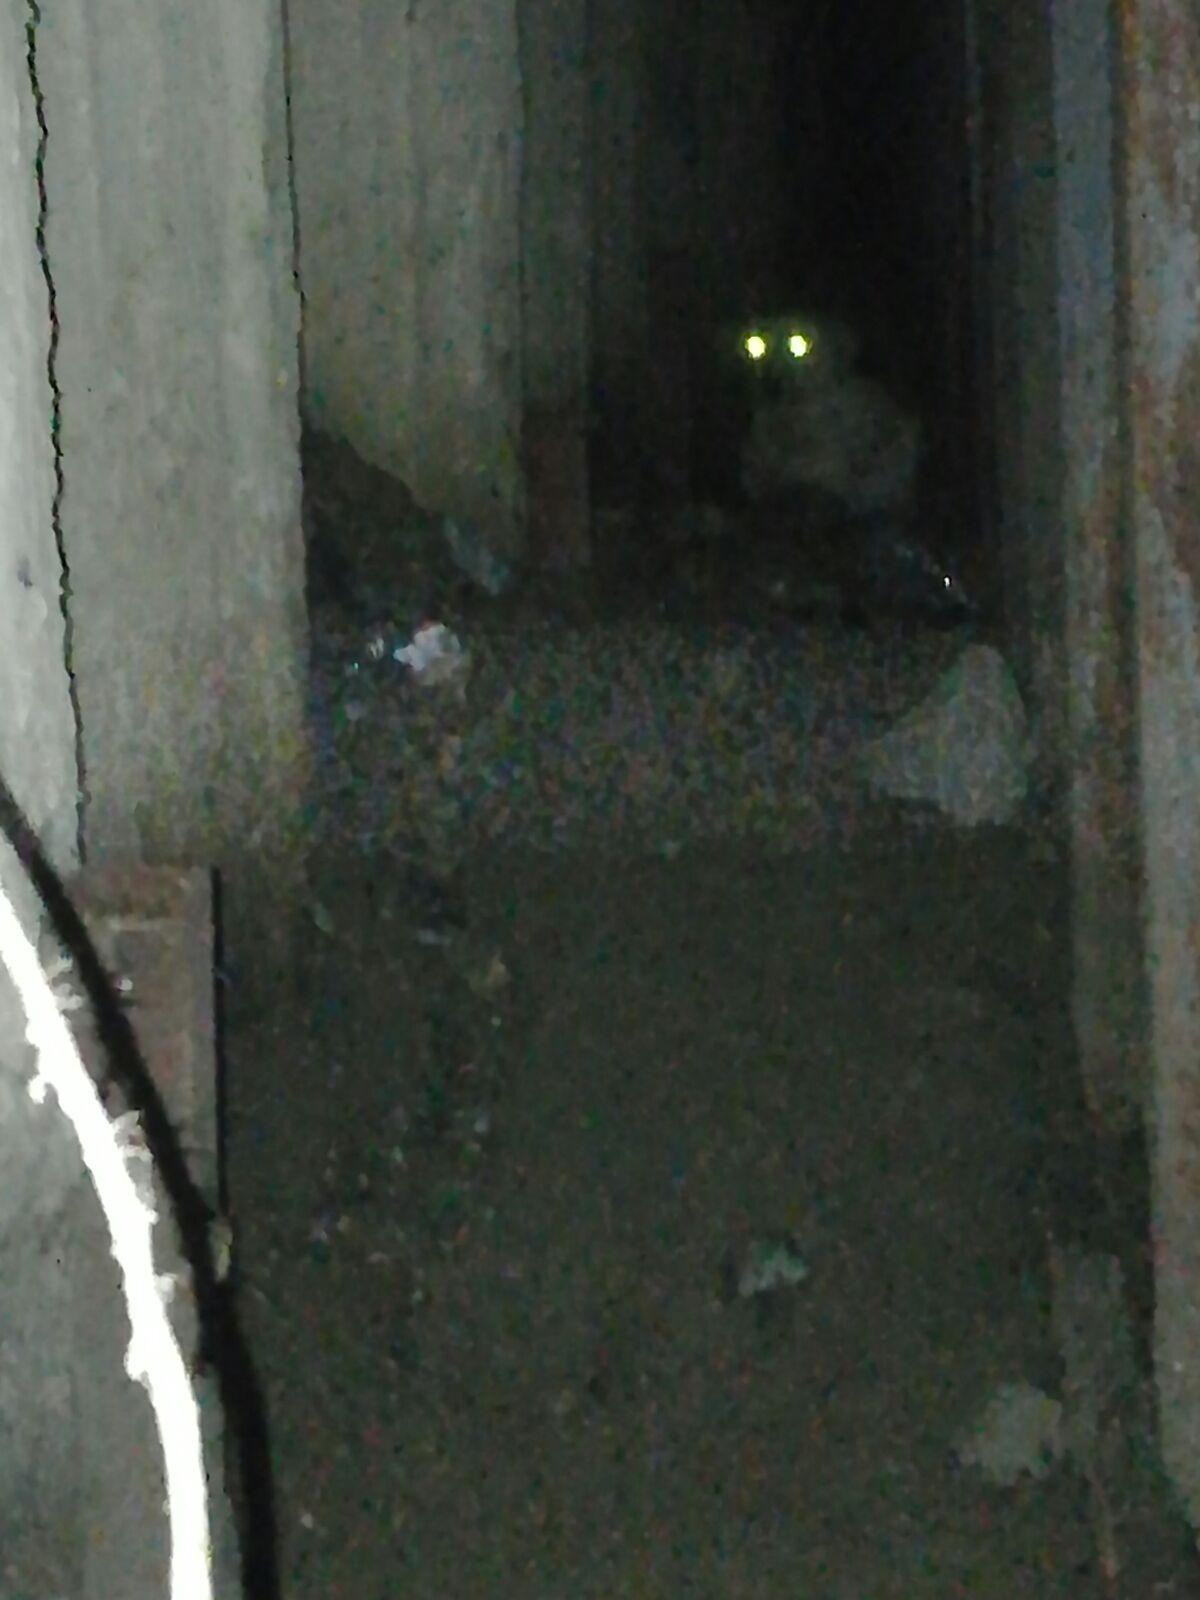 Esenyurtta hayvan kurtarma - Haberler - İstanbul İtfaiyesi